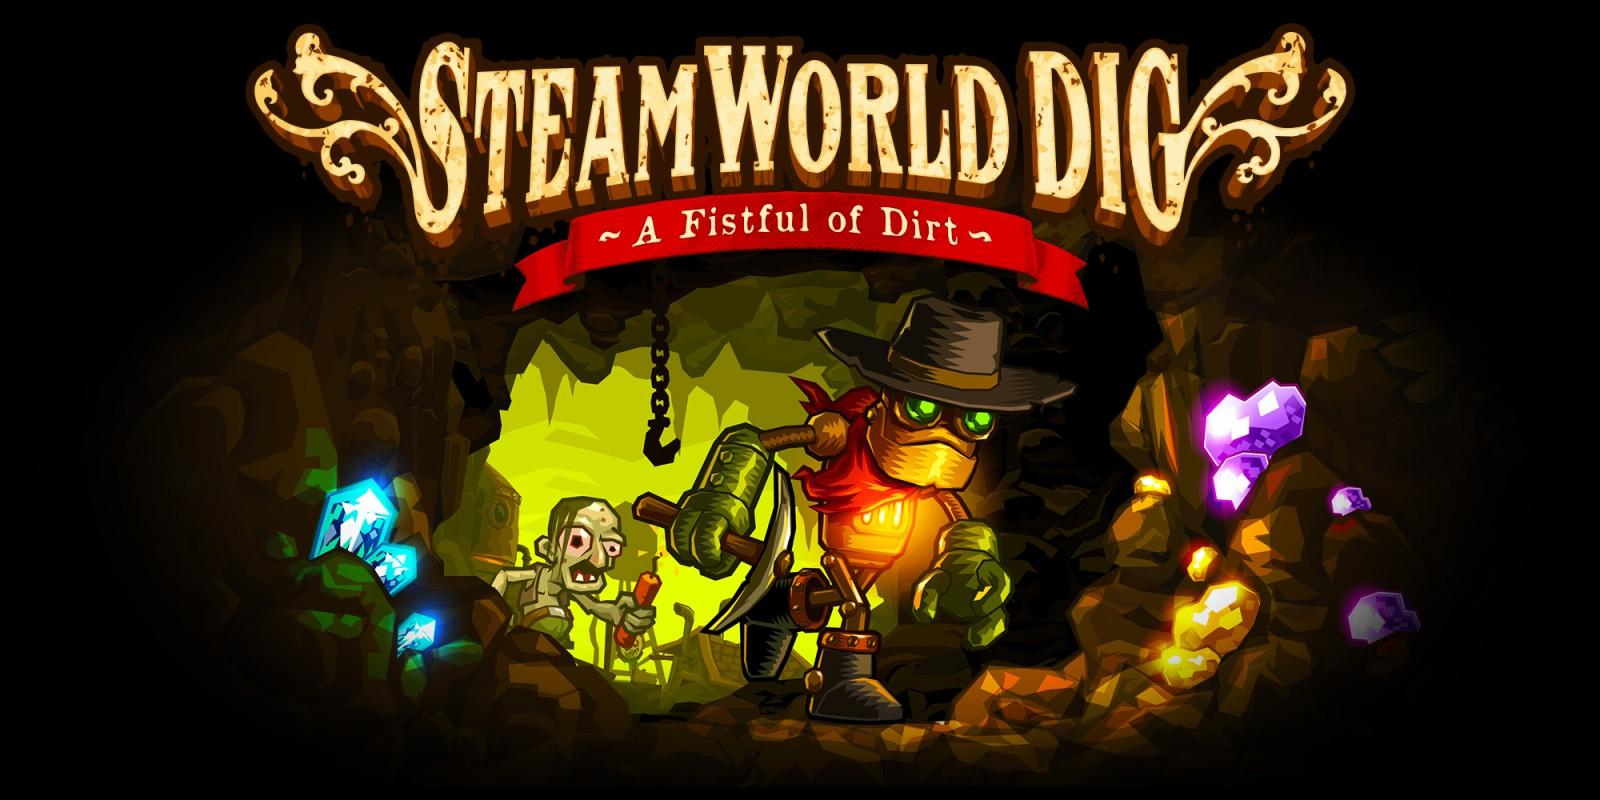 SteamWorld Dig (eShop)